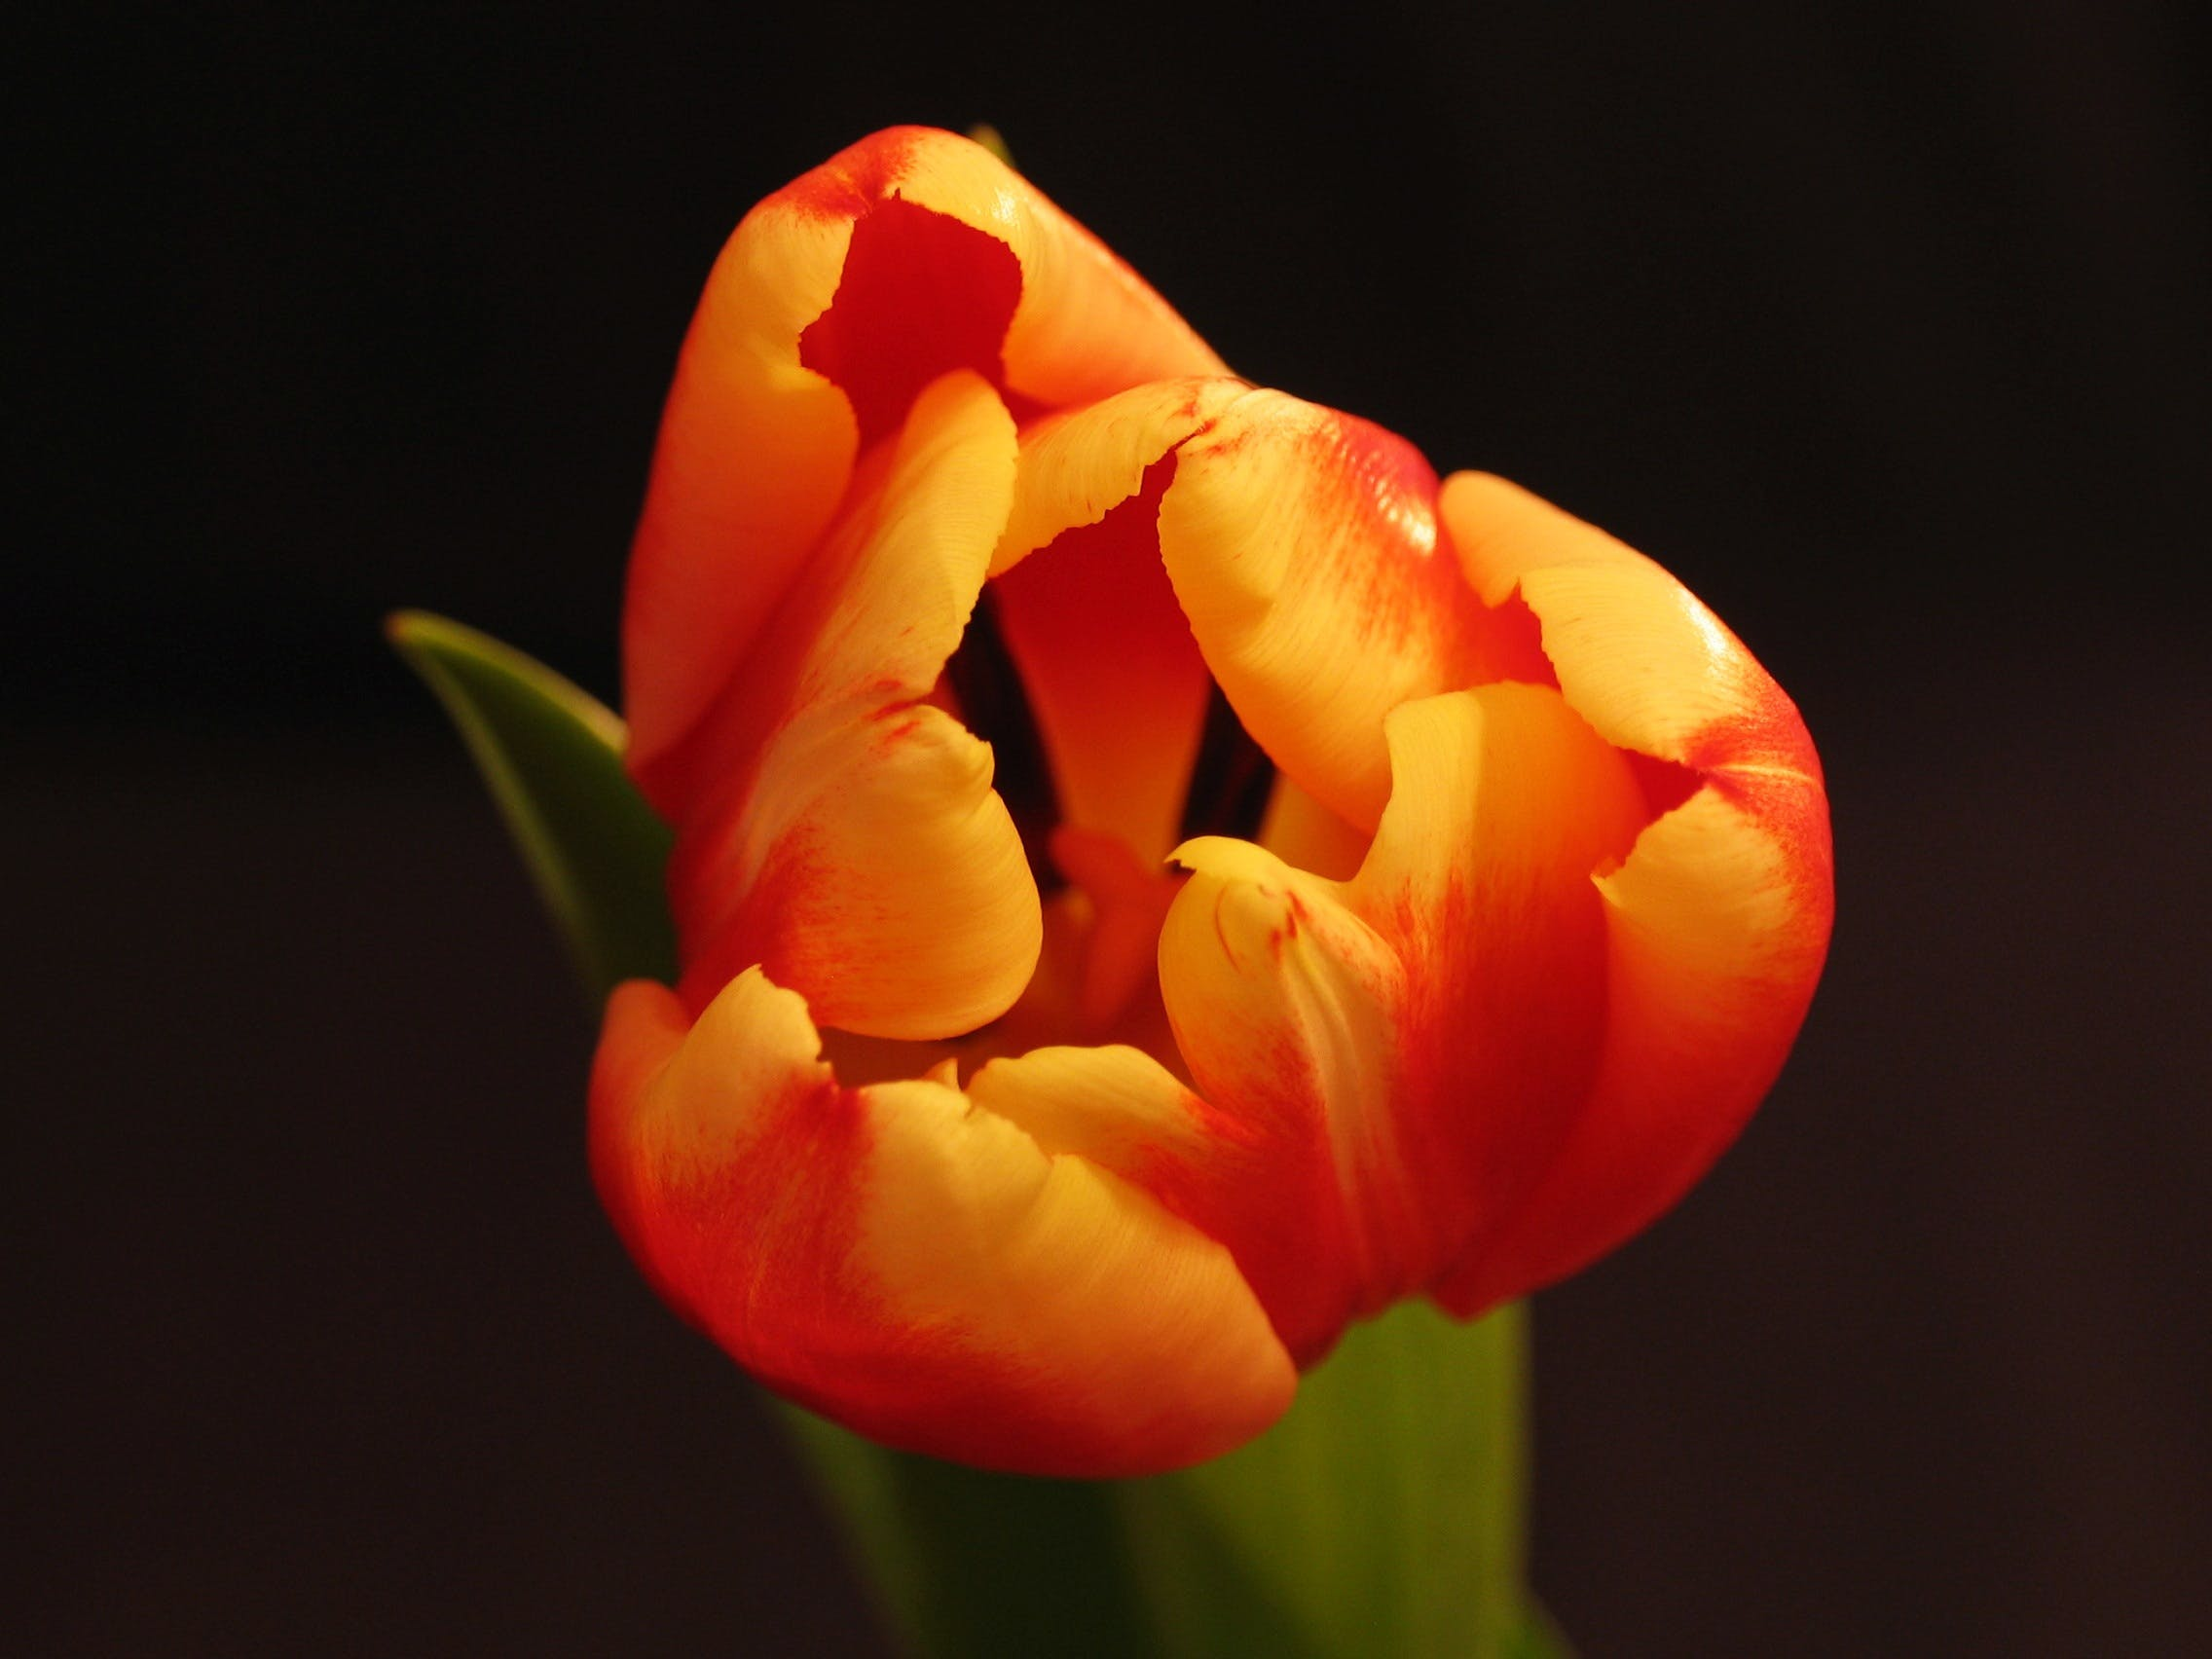 Free stock photo of nature, petals, plant, orange